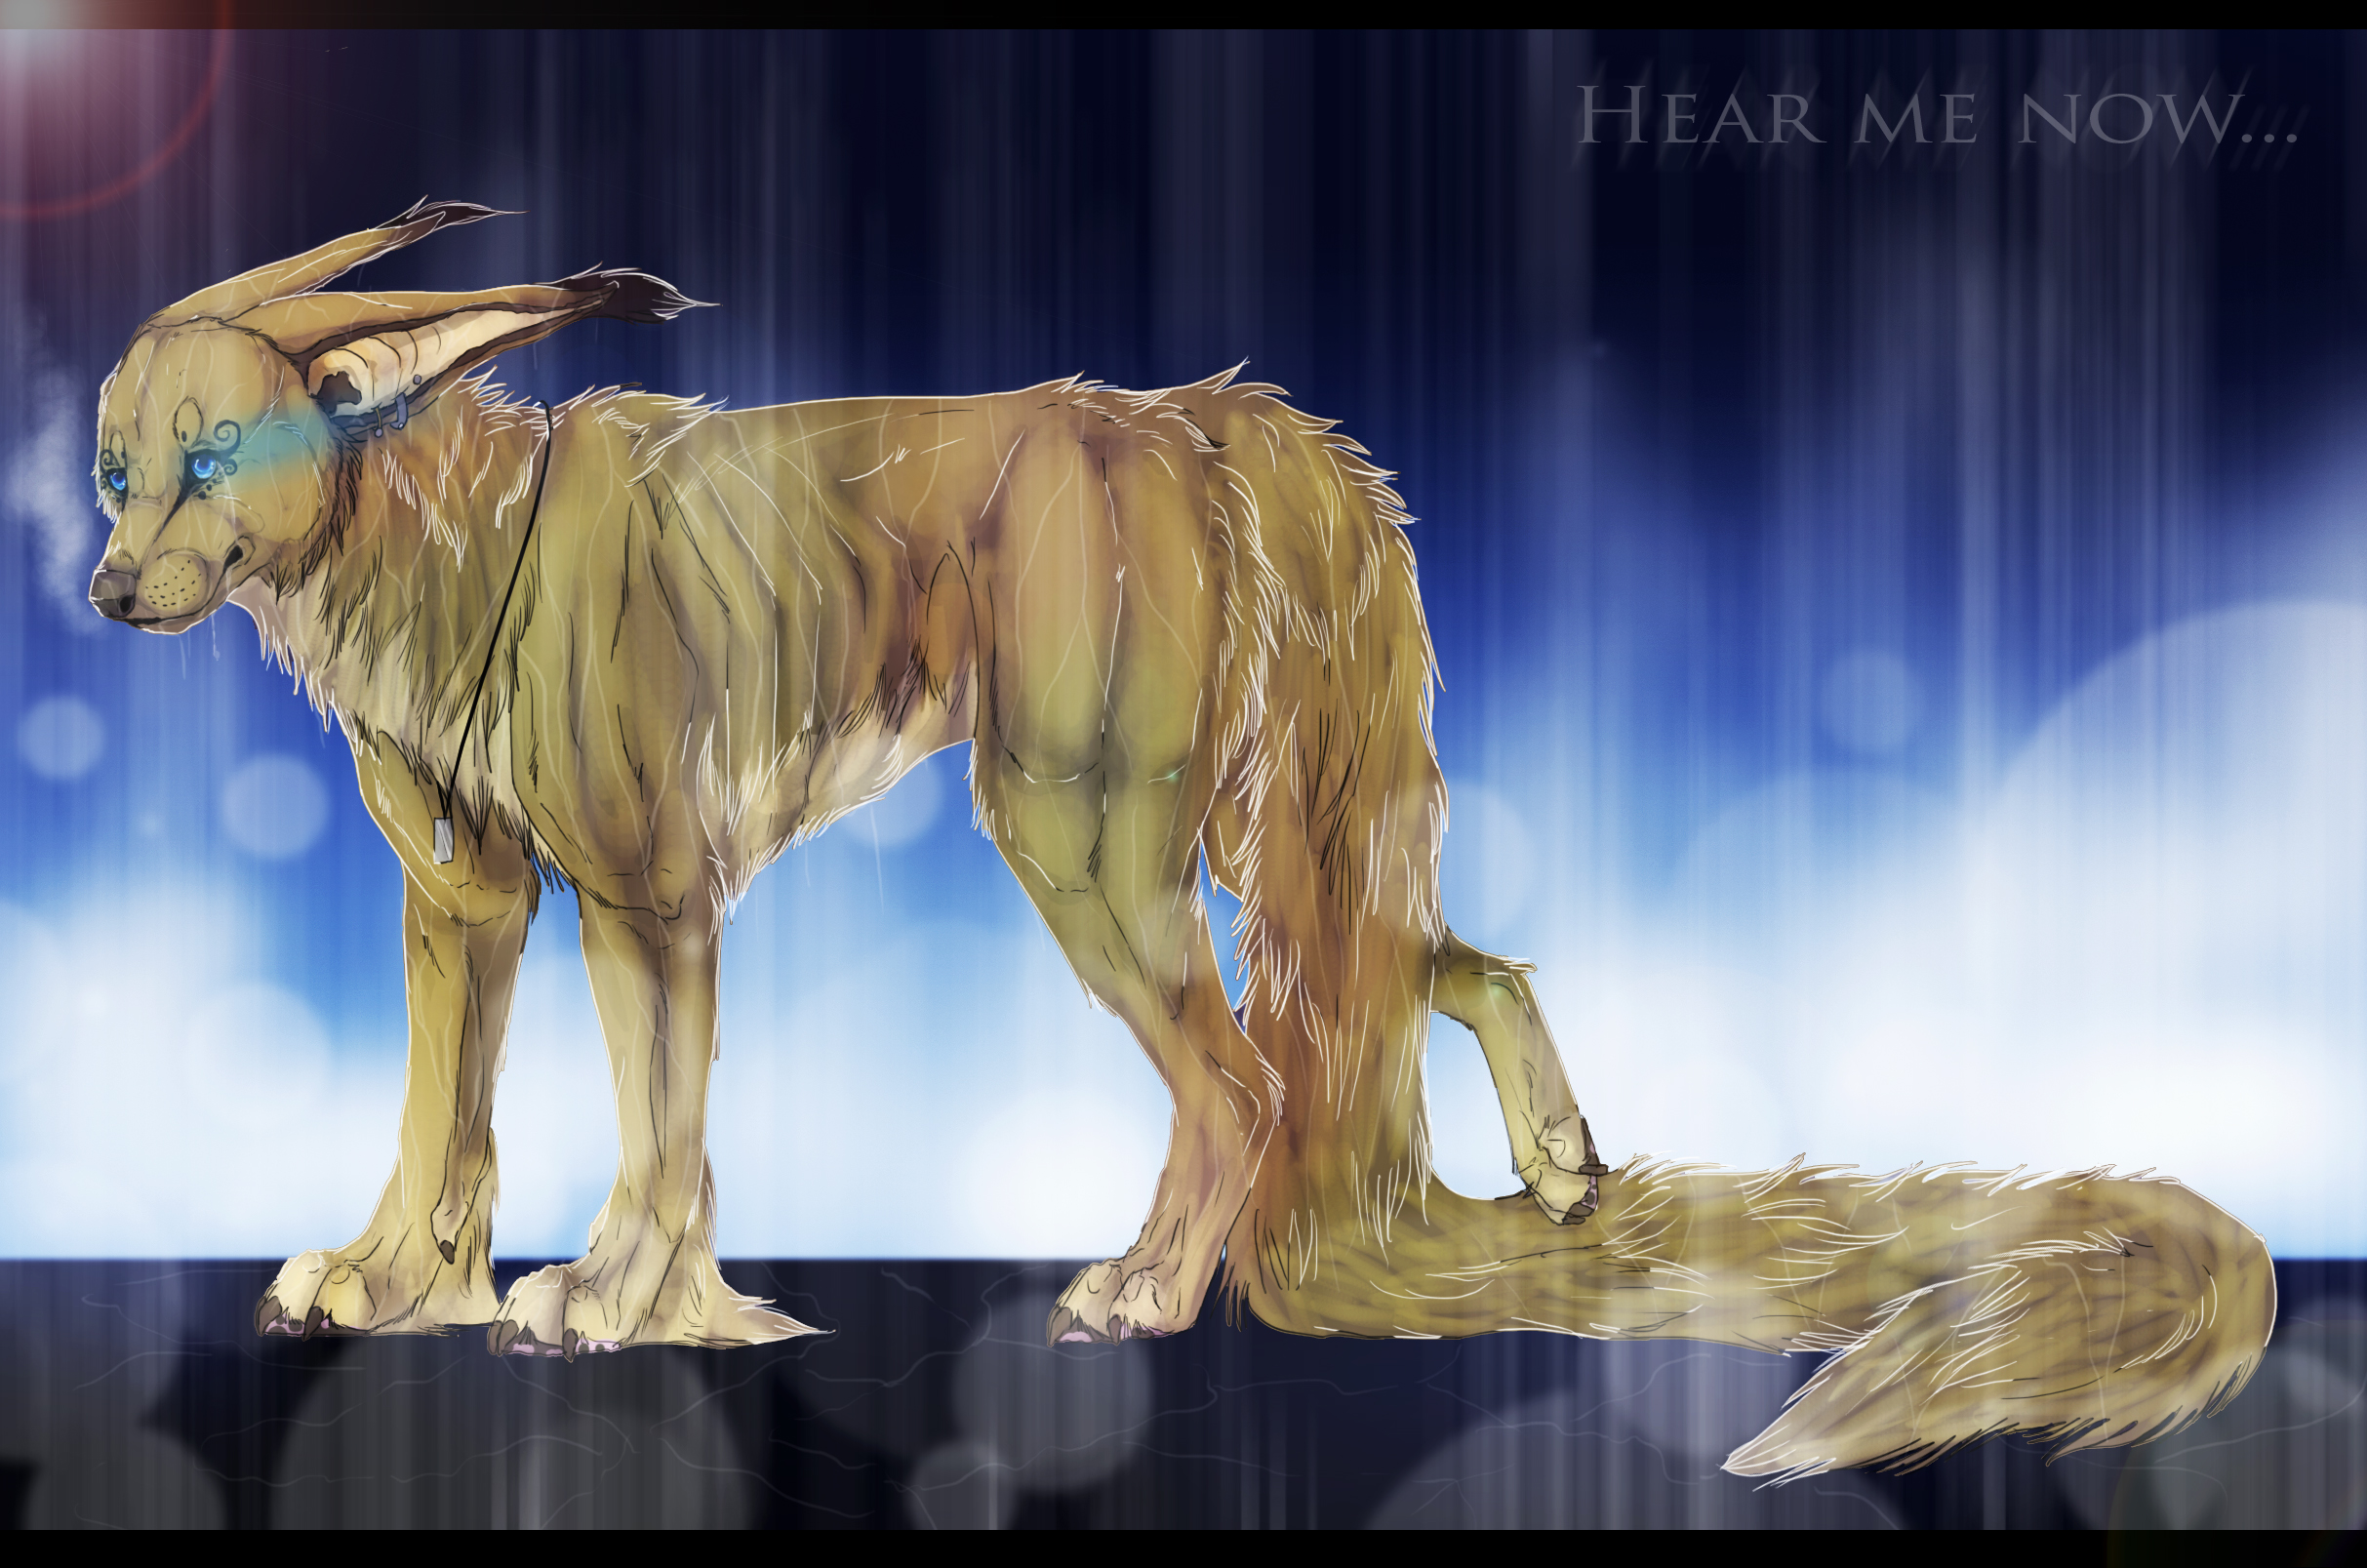 Dessins de chiens - Page 2 ___hear_me_now____by_skaella-d69agyr